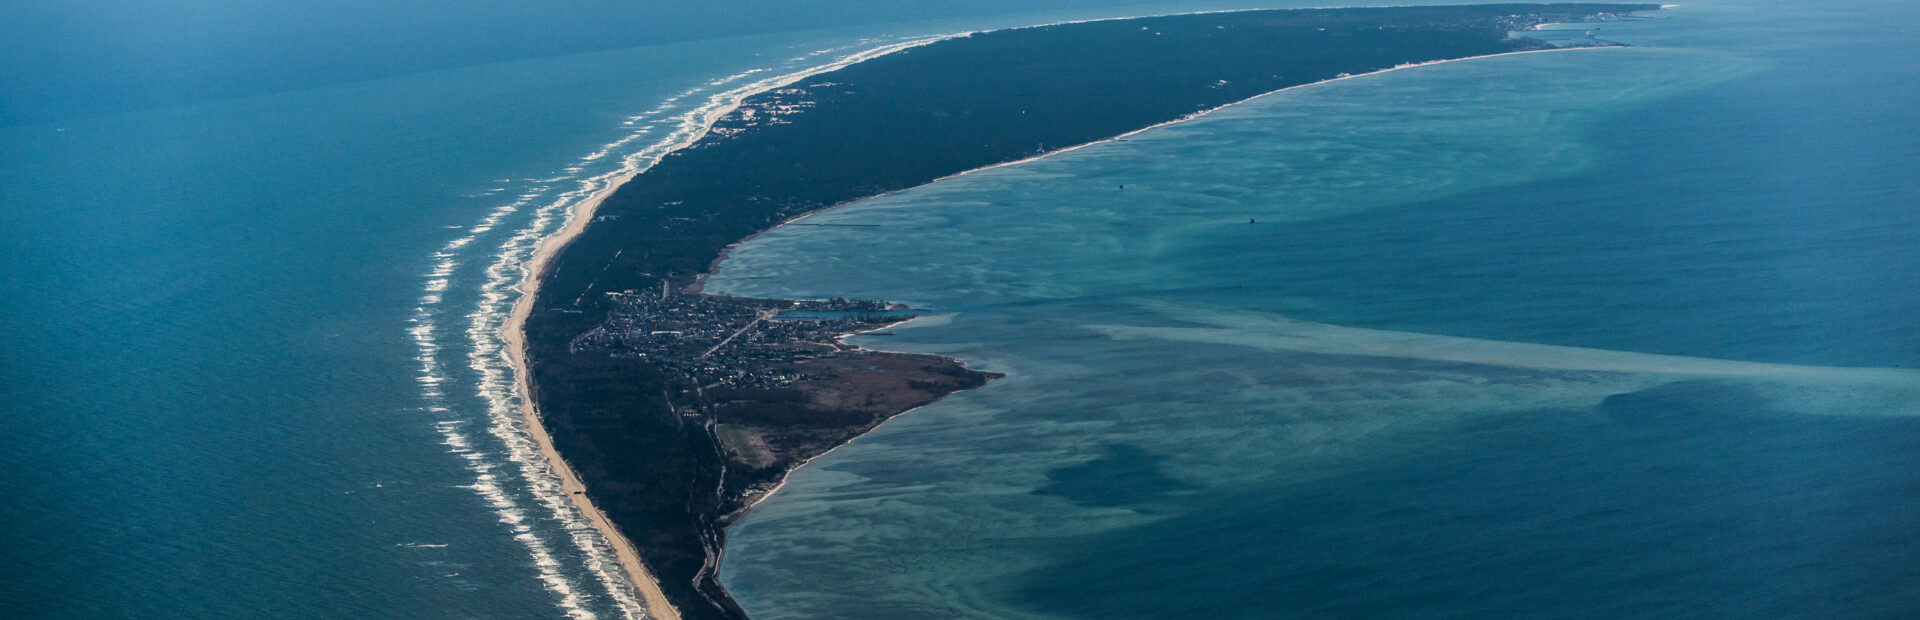 Hel Peninsula. Between the sea and the bay